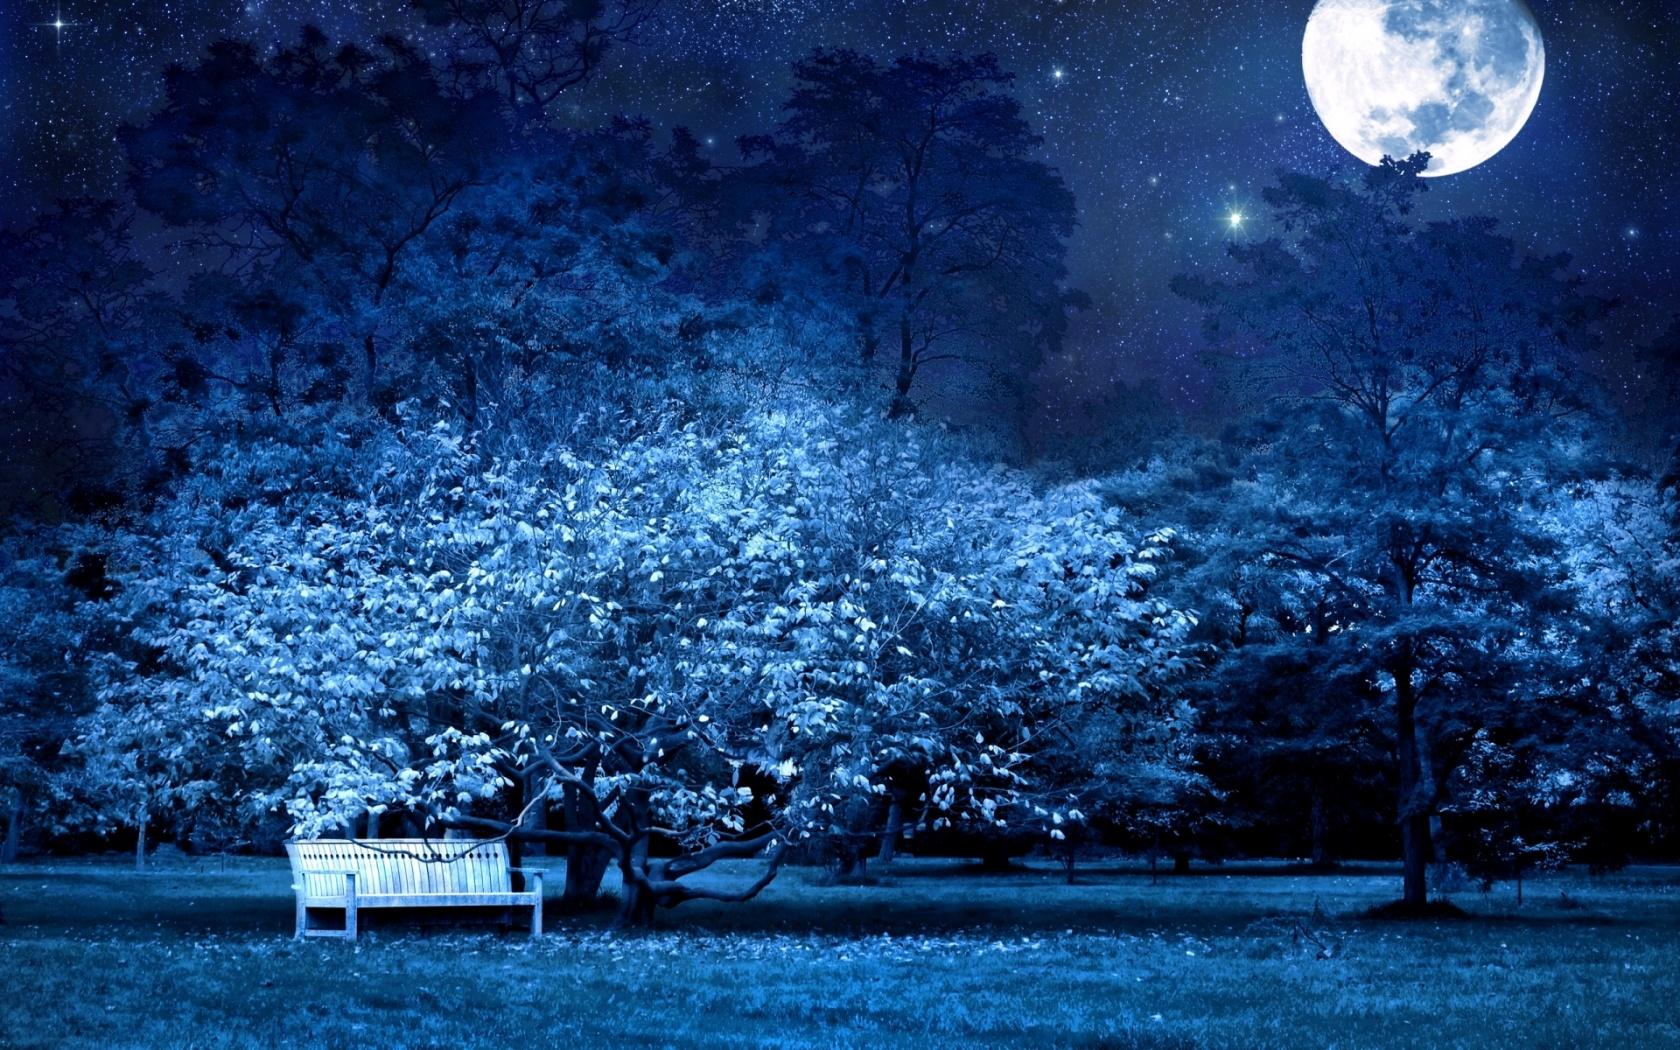 beautiful night wallpaper hd 100 Freetopwallpapercom 1680x1050